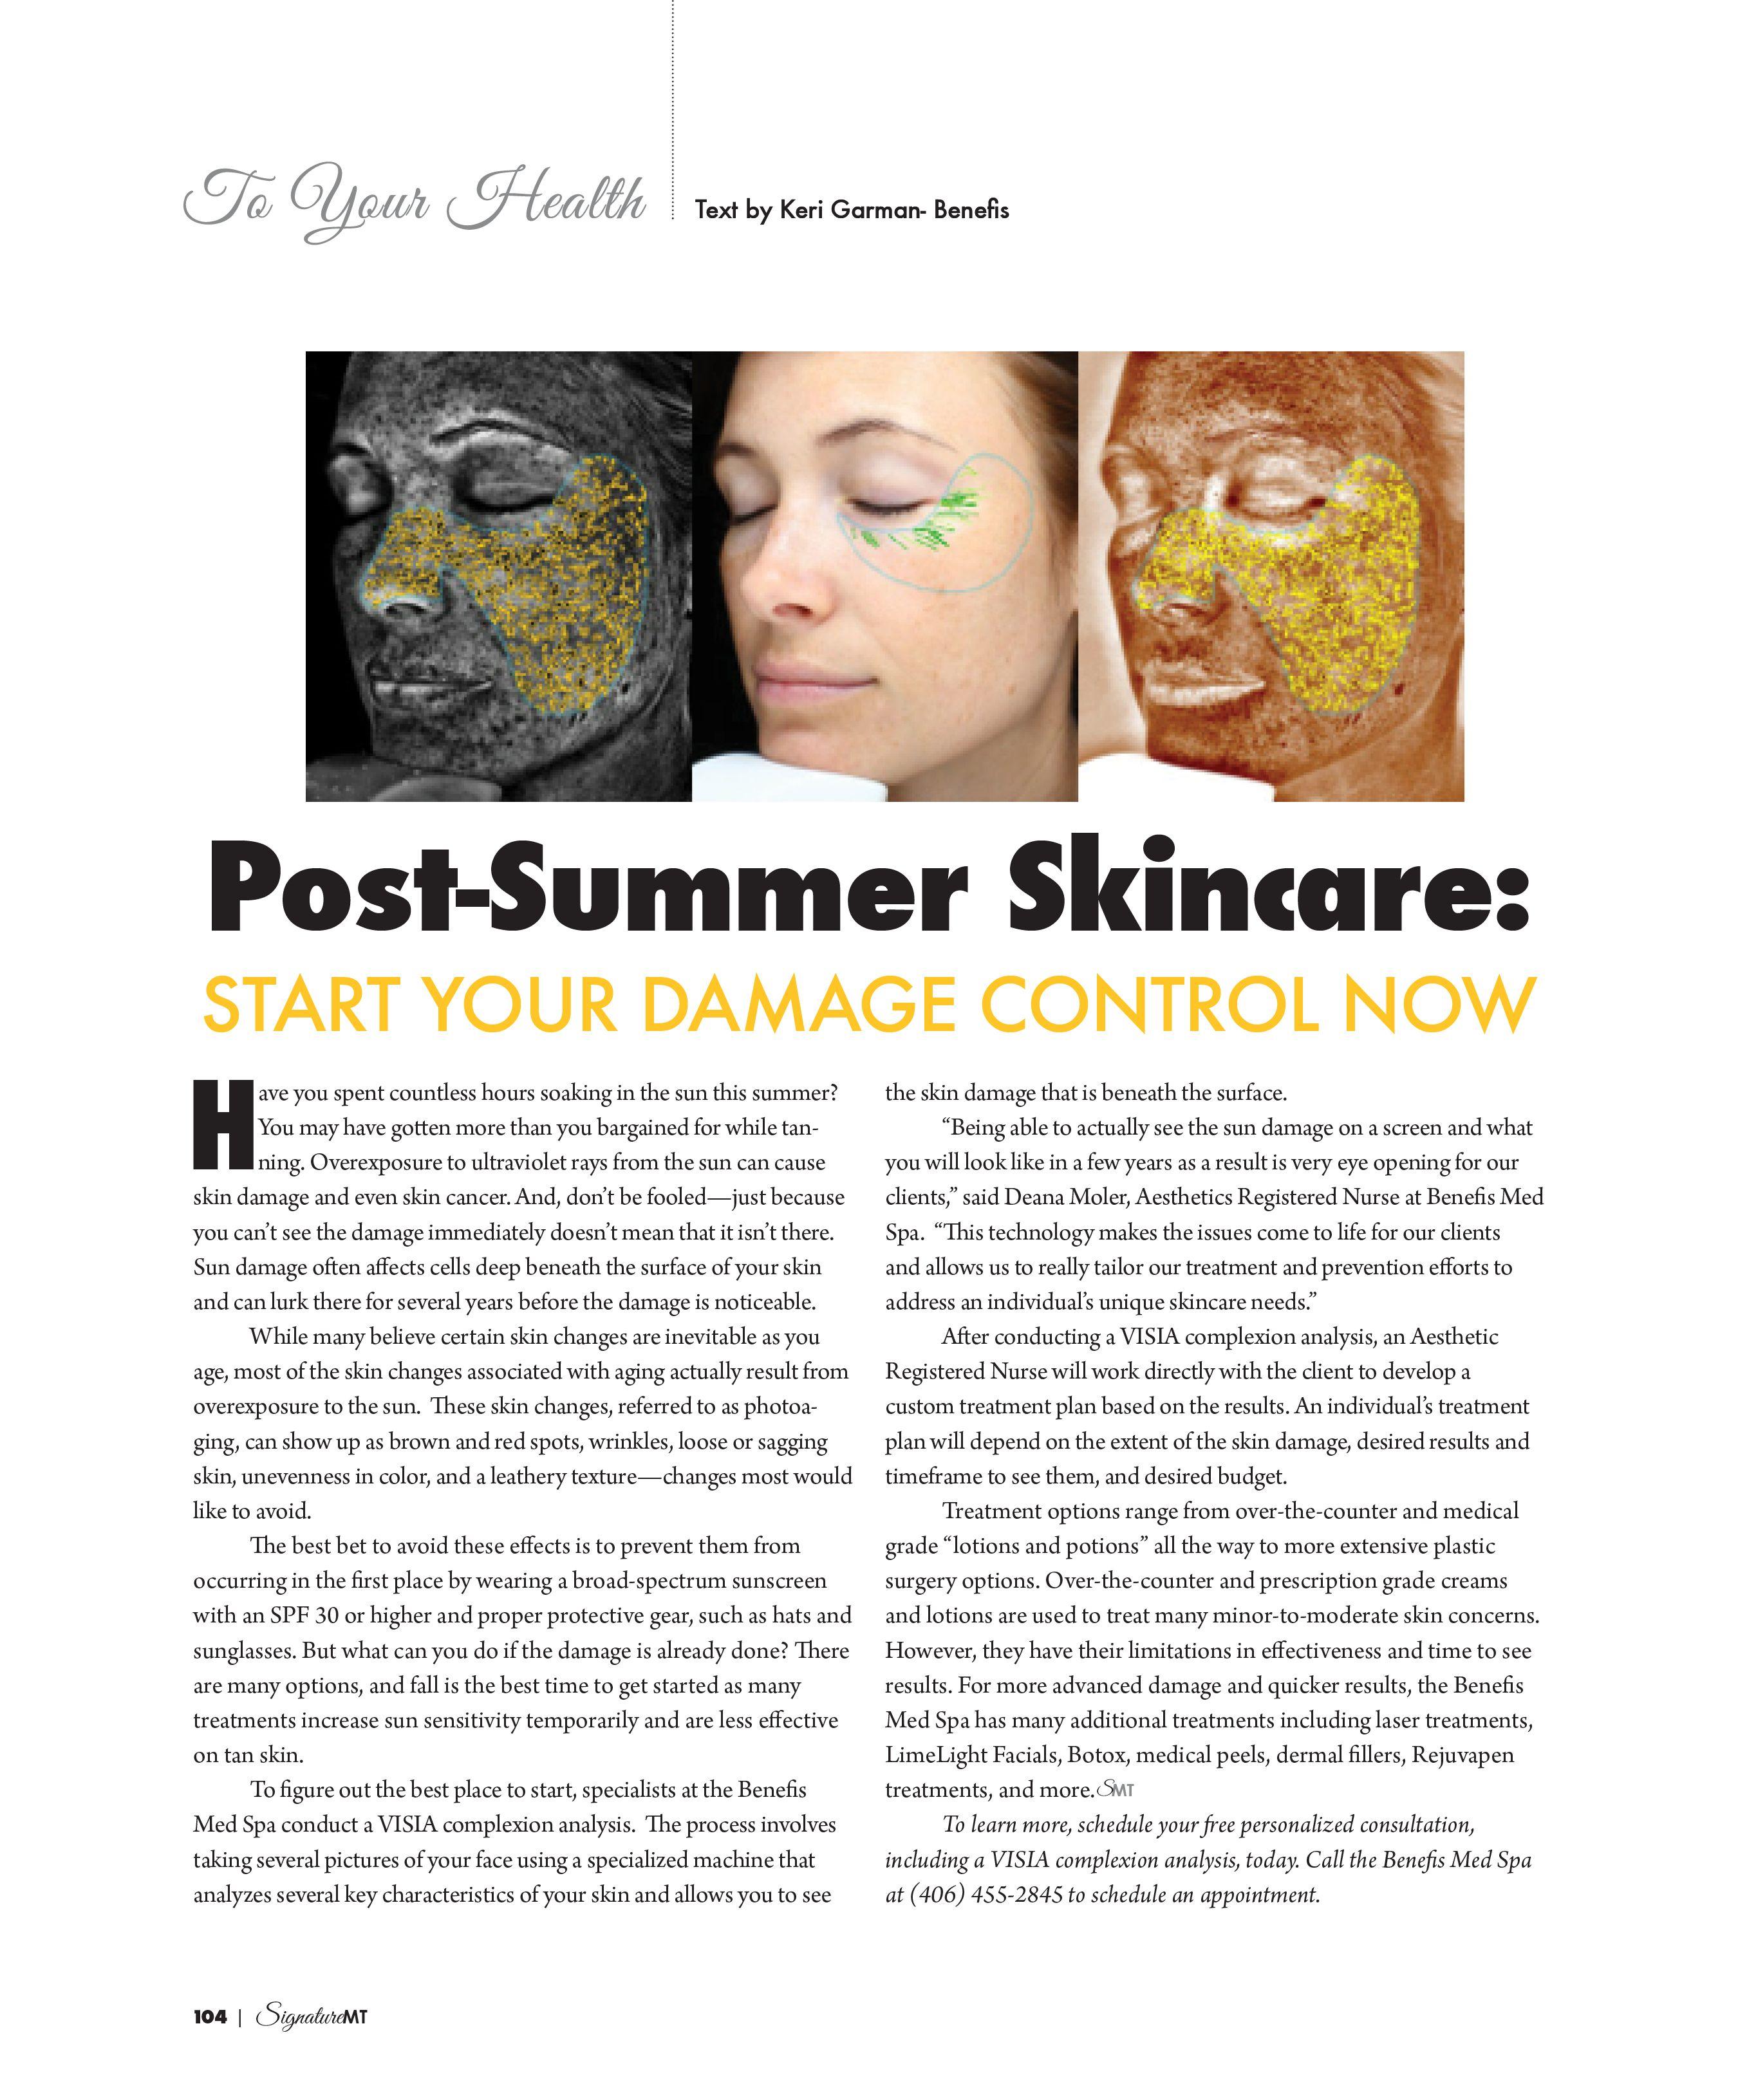 Post-Summer Skincare